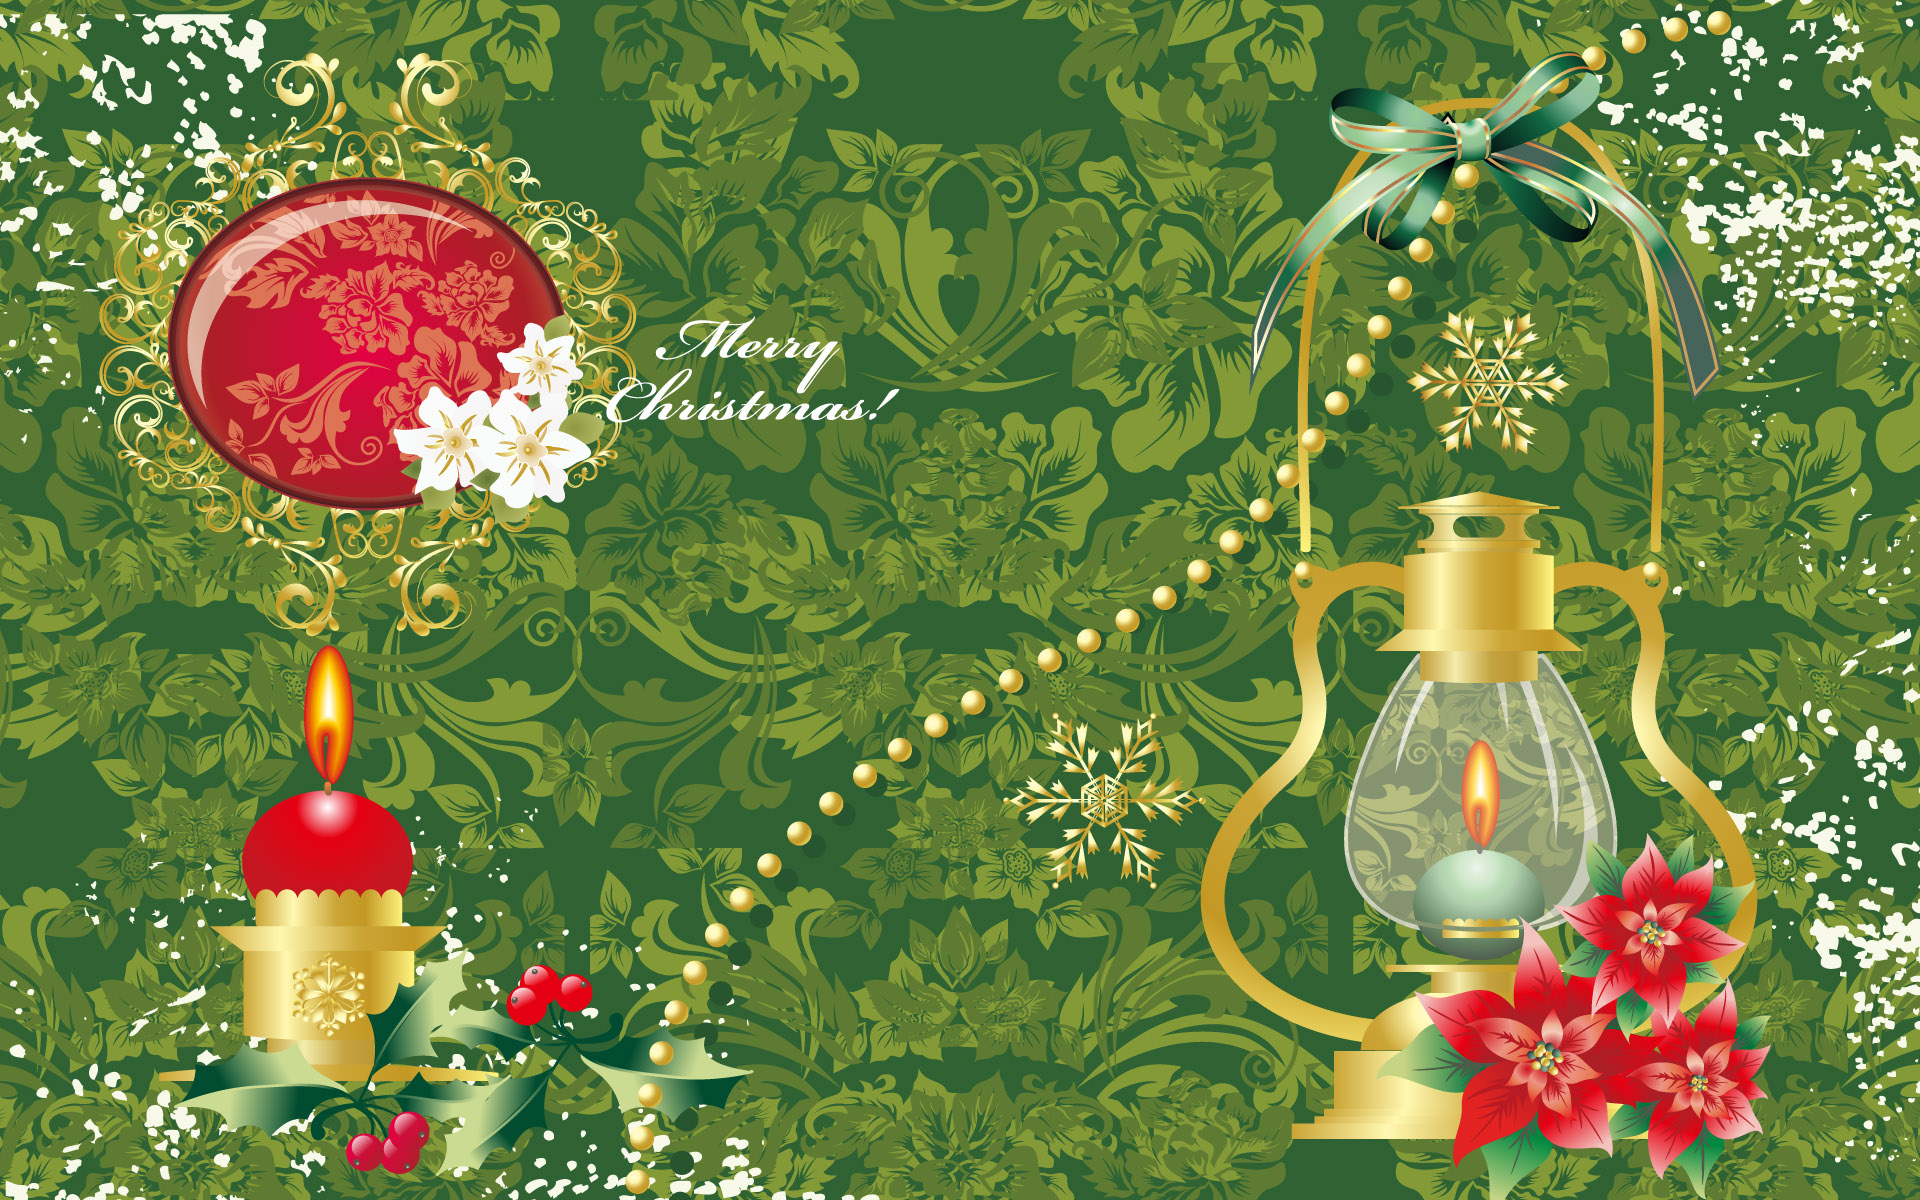 Gmail themes holiday - Holiday Christmas Christmas Ornaments Merry Christmas Wallpaper